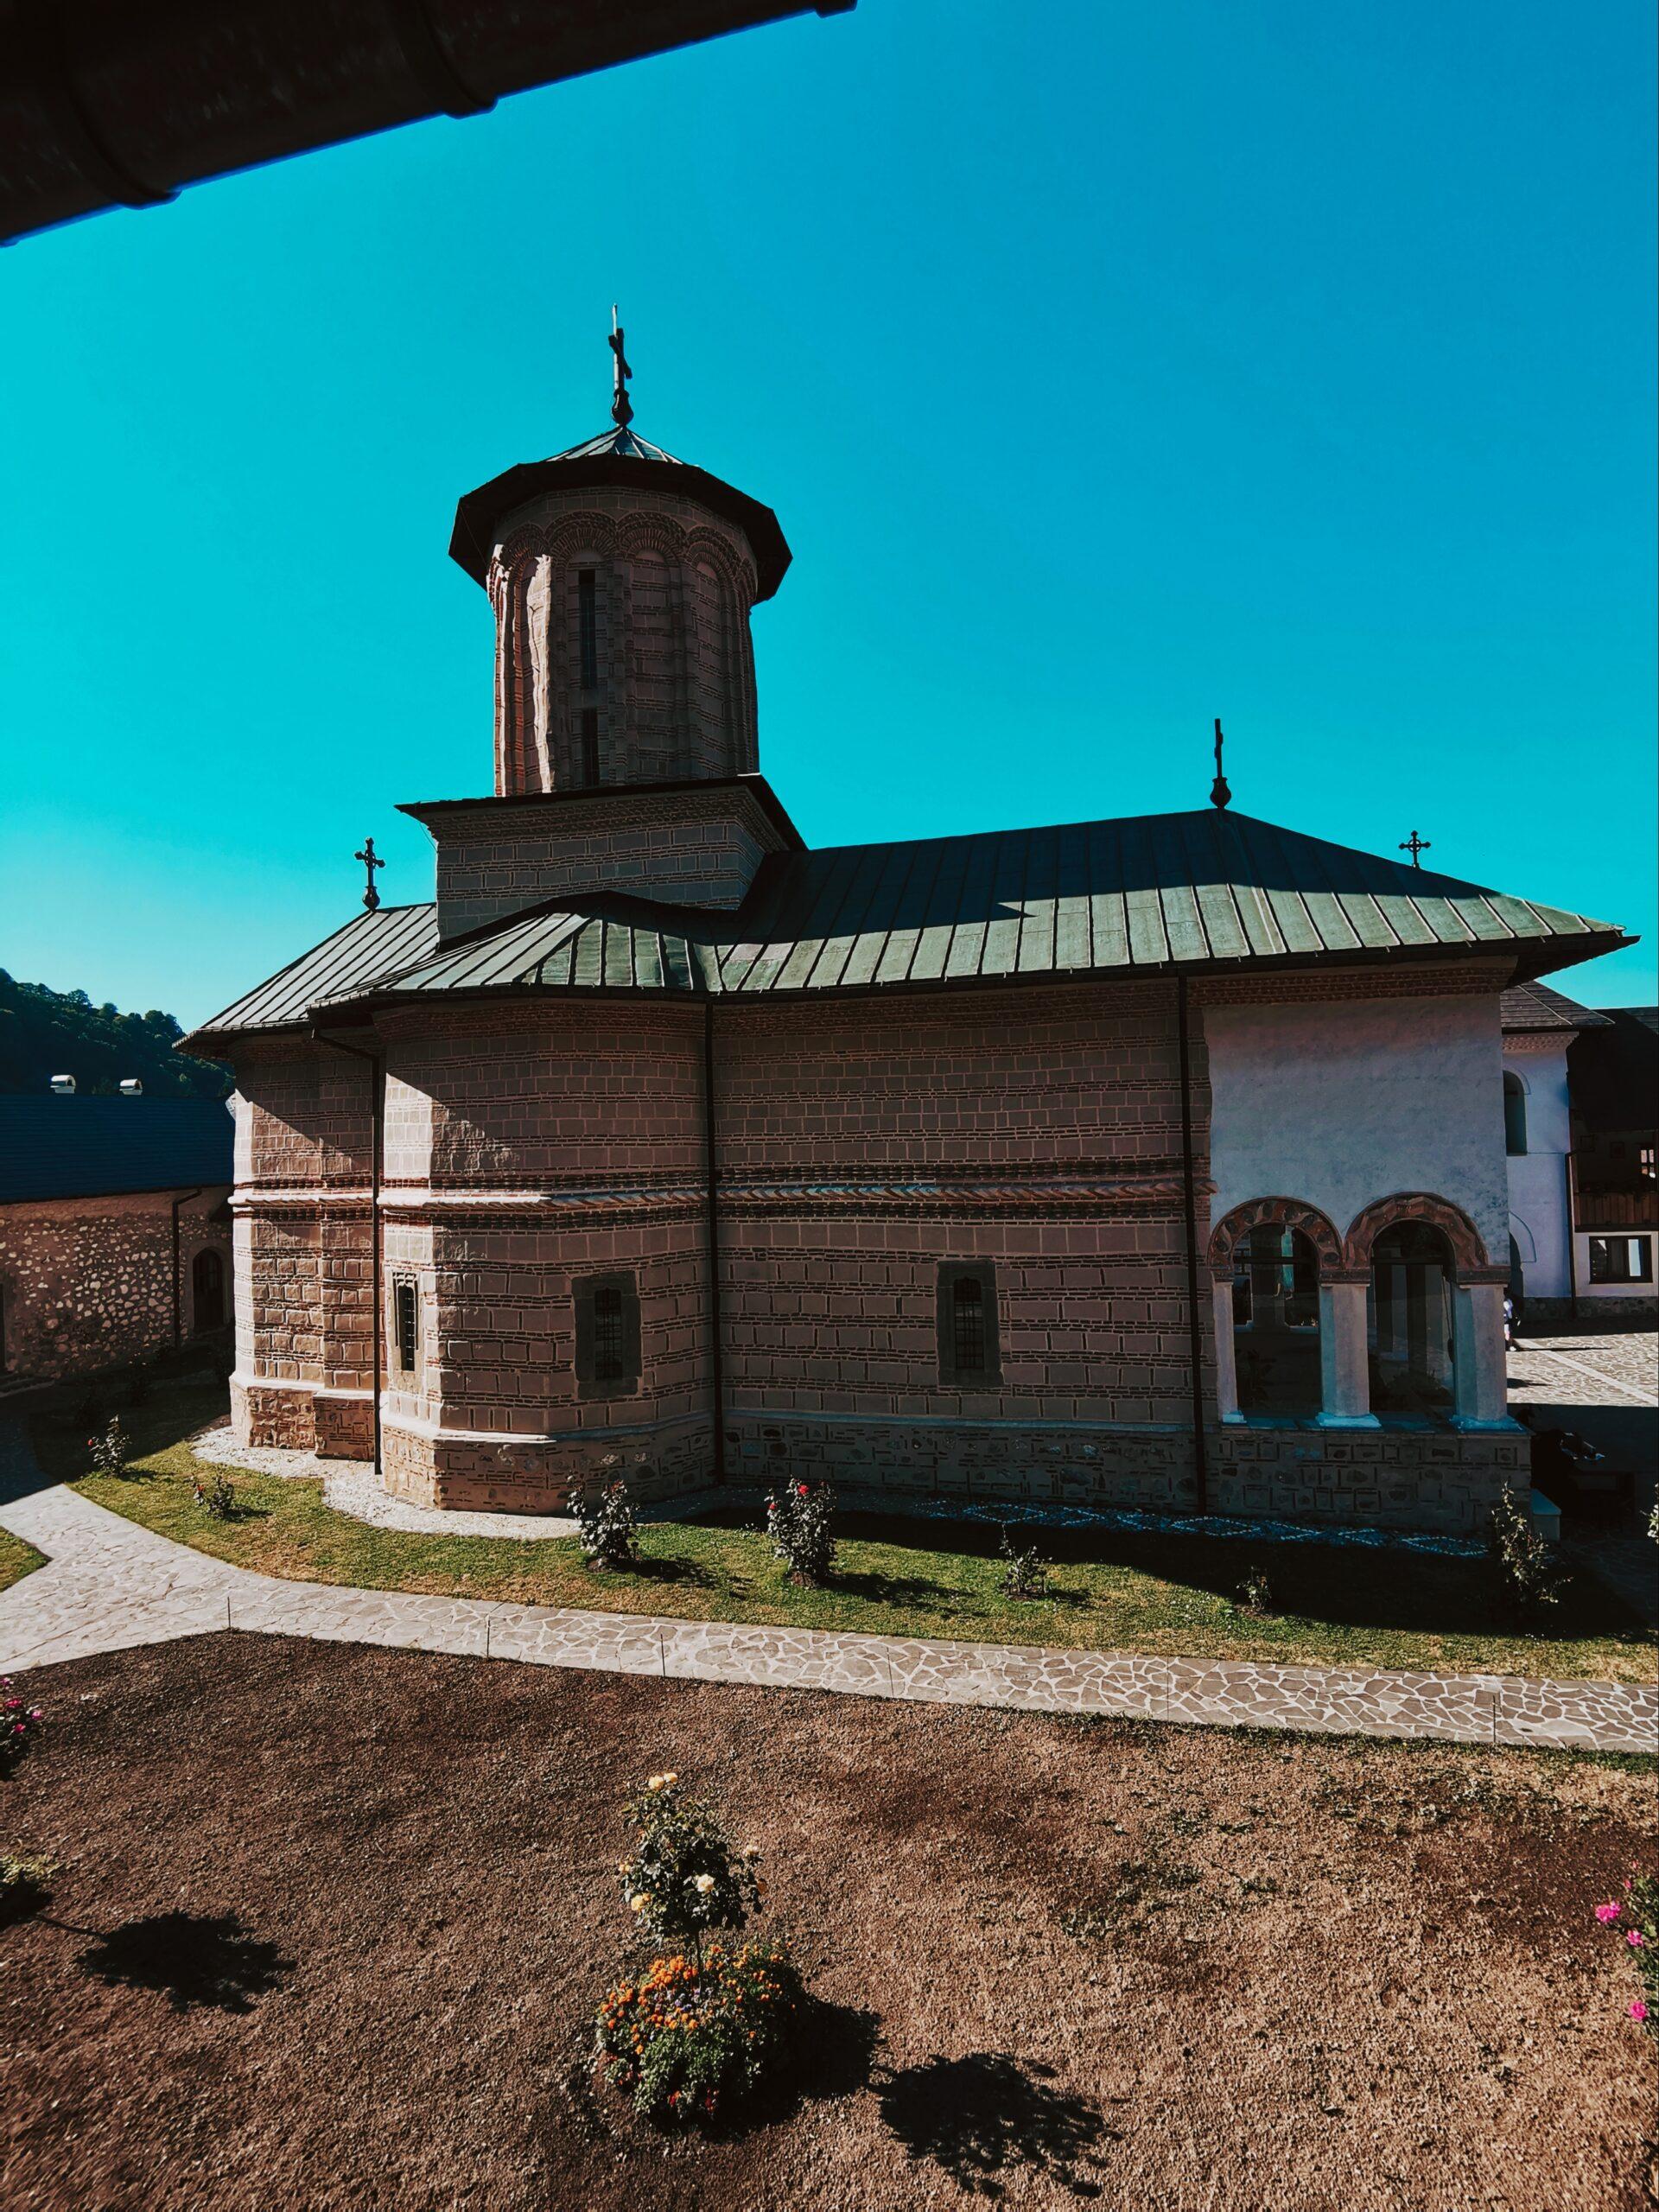 Manastirea Polovragi Biserica